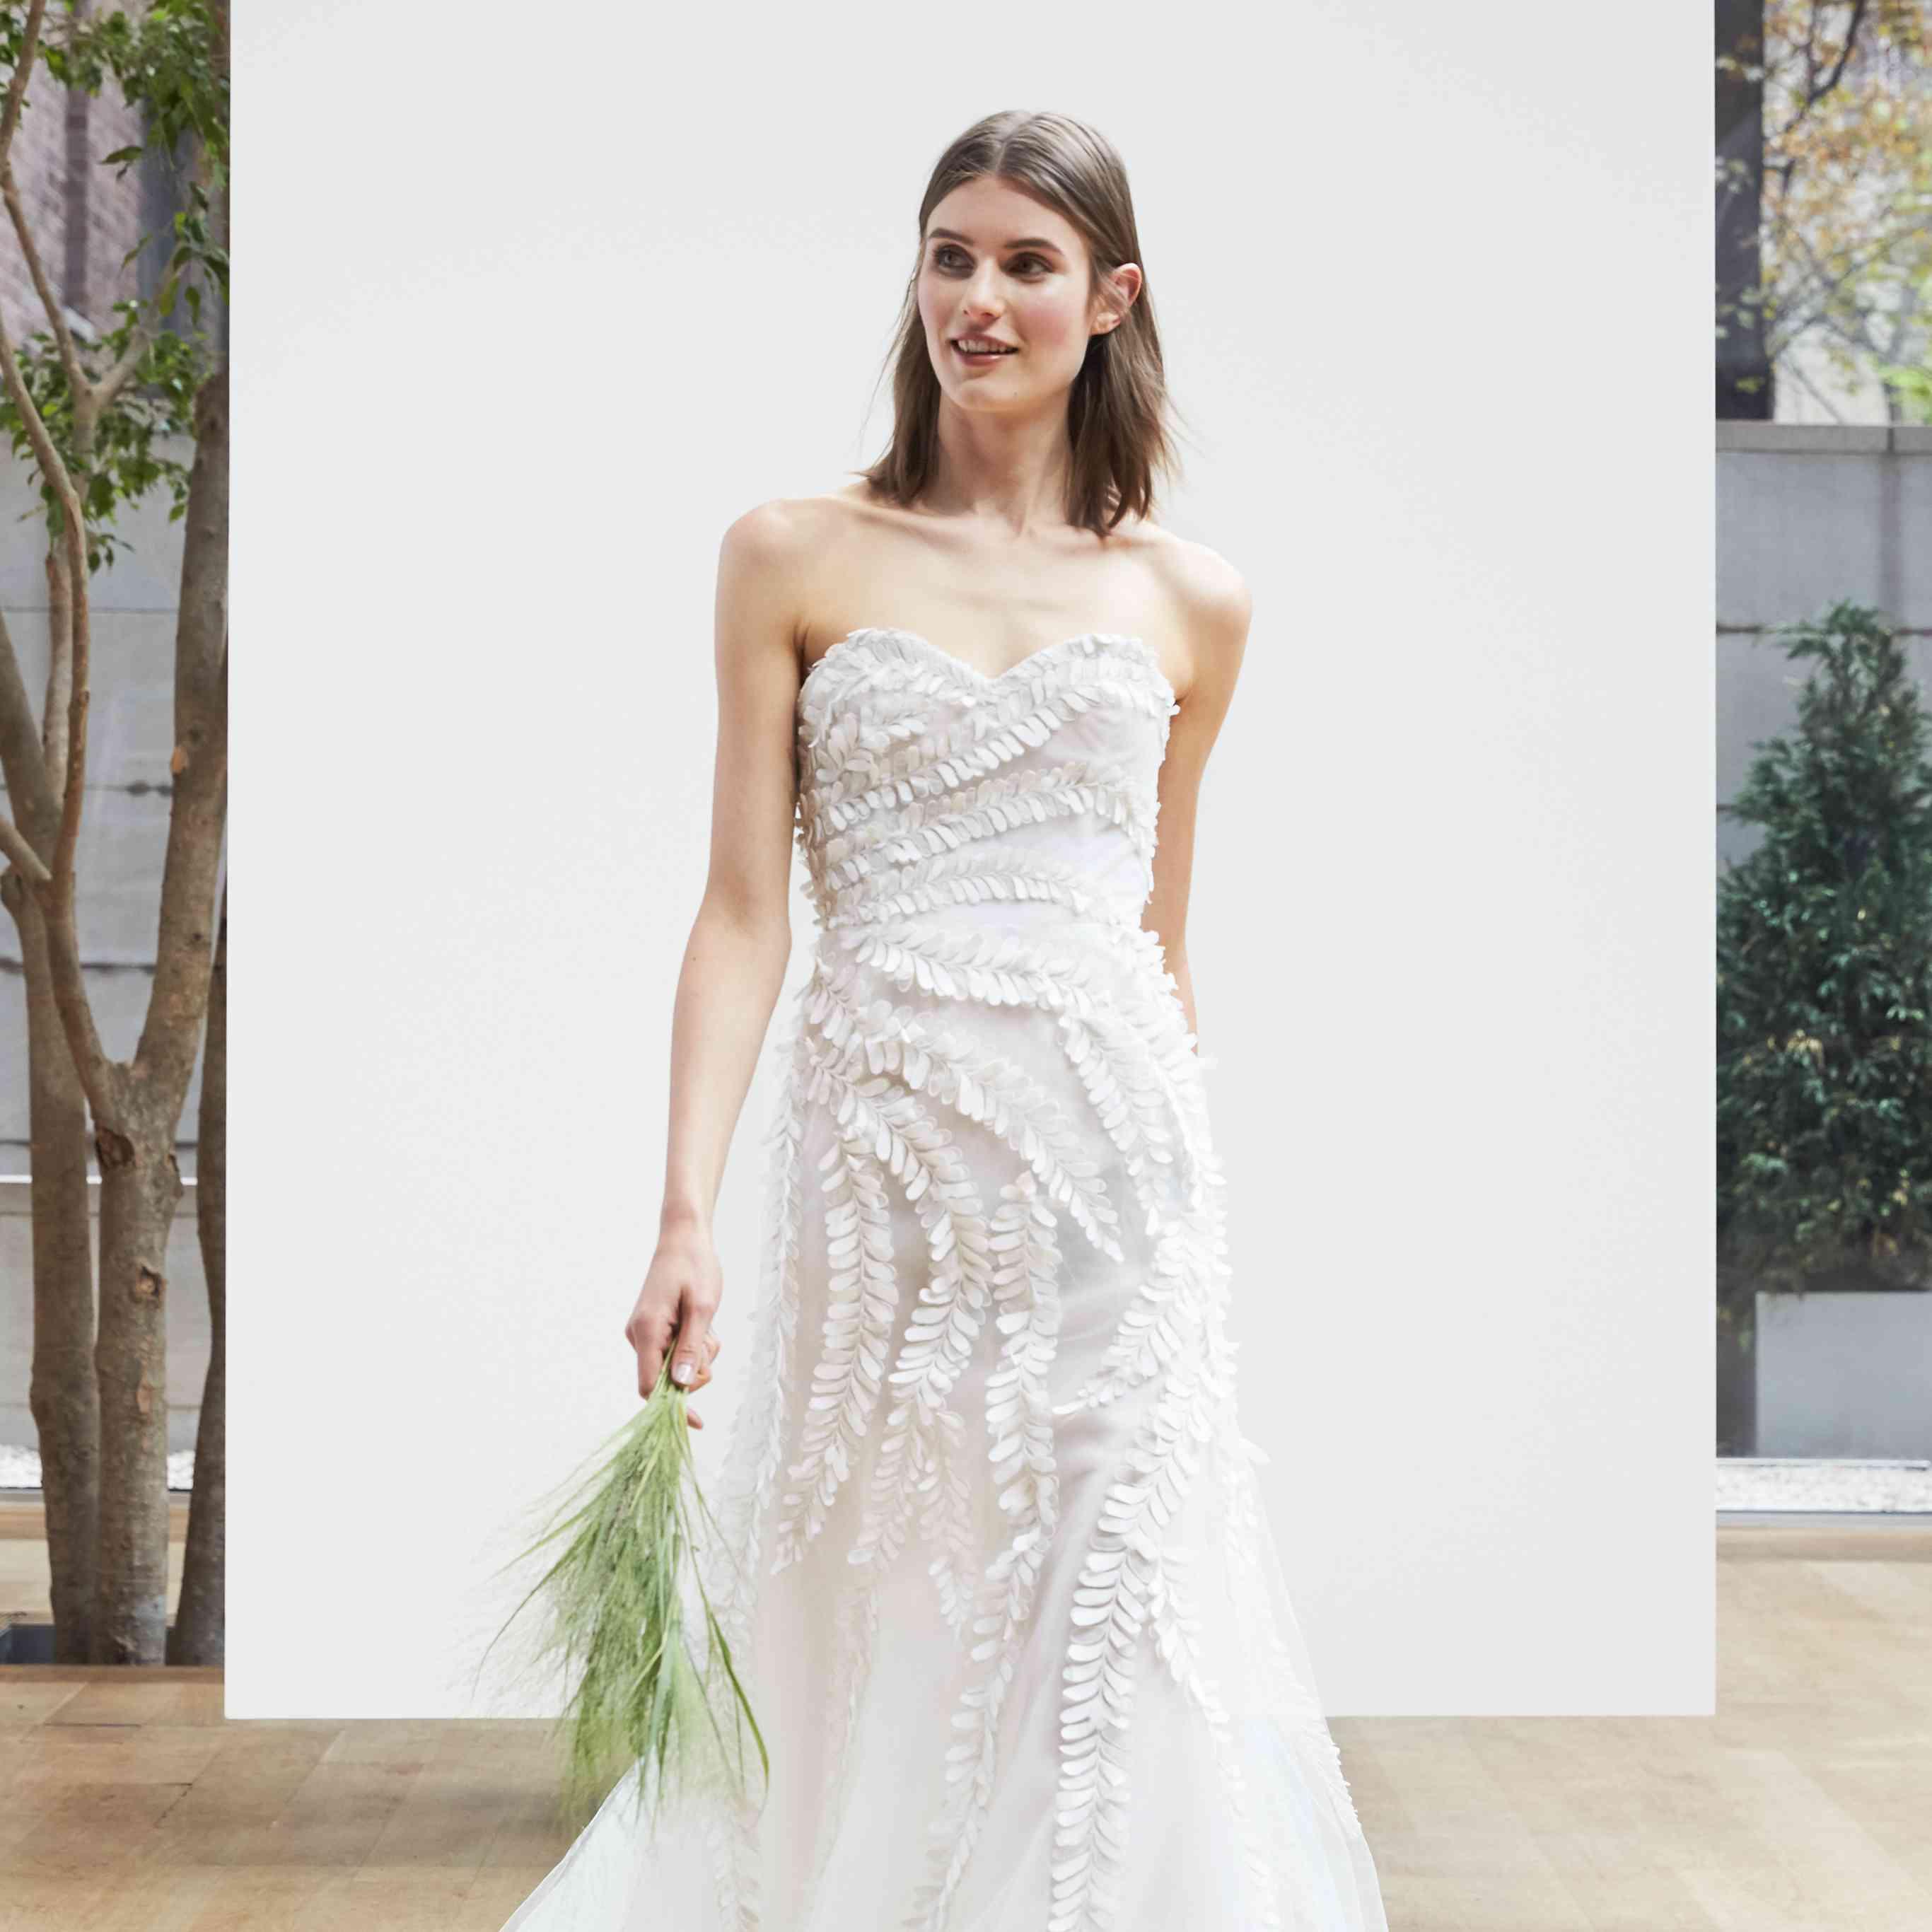 100 Wedding Dresses Perfect For Petite Figures,Wedding Guest Purple Plus Size Dress